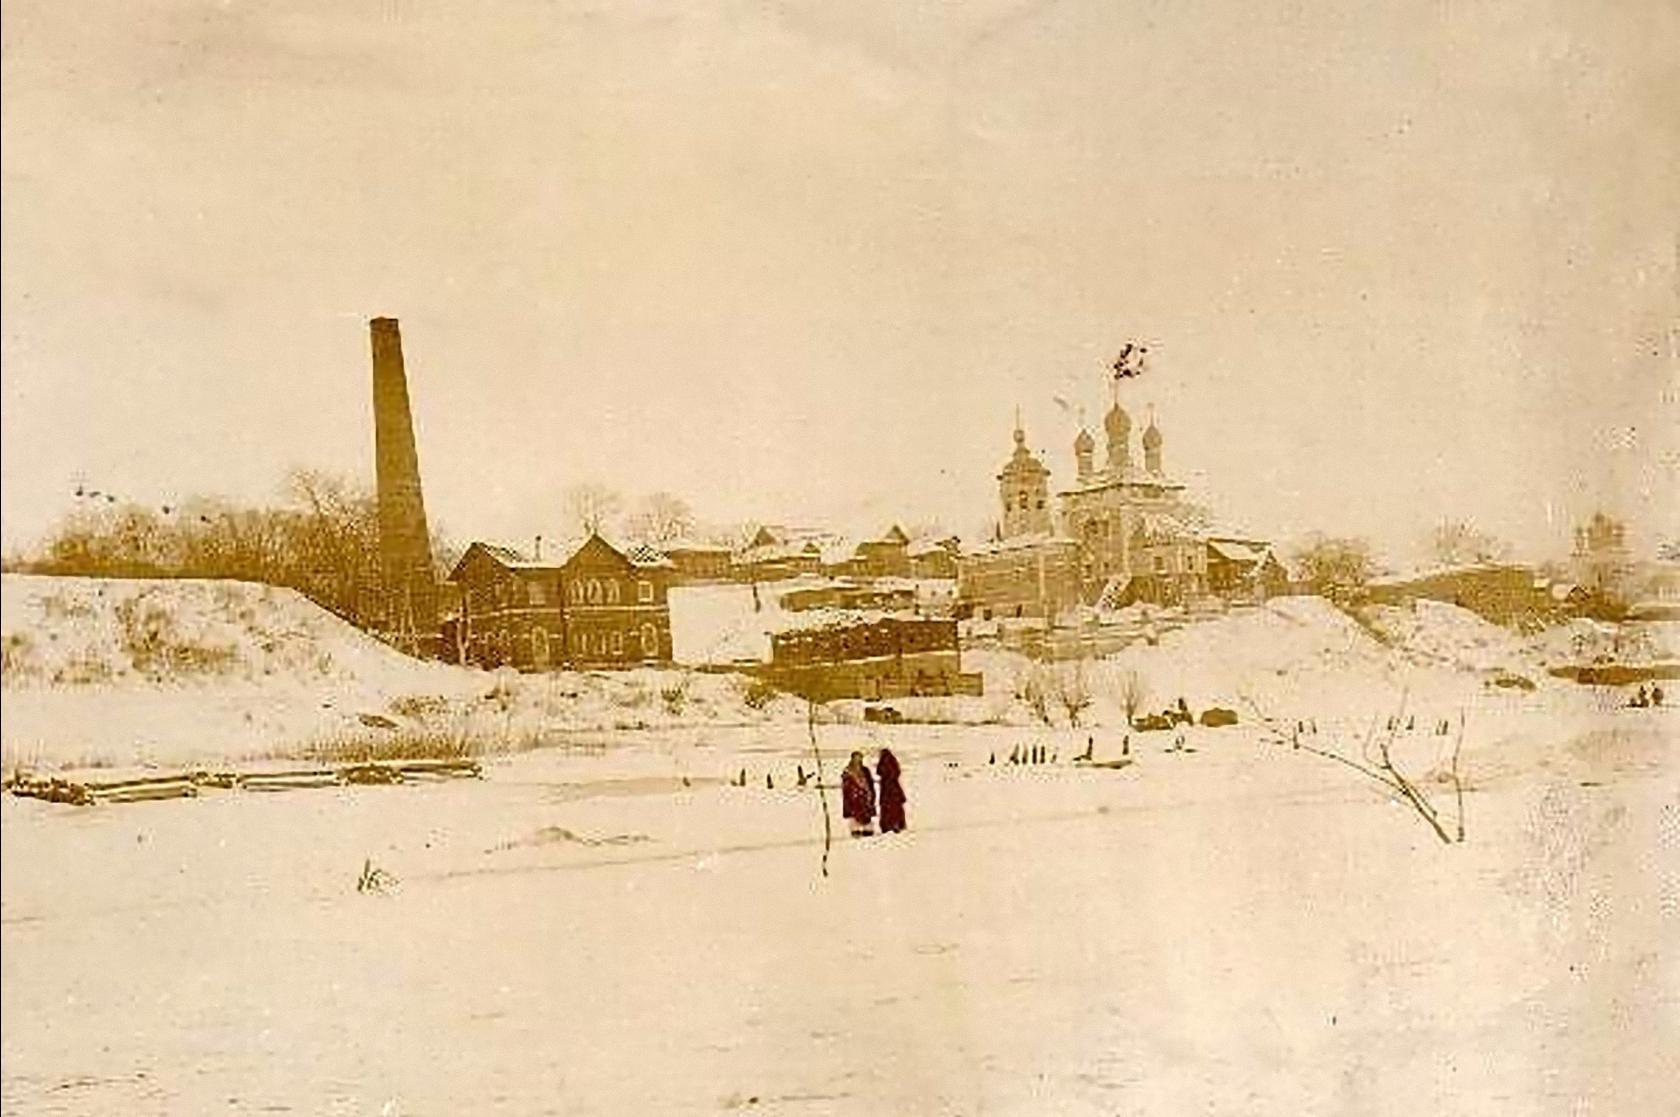 Вид с реки на Николо-Набережную церковь и водокачку. Середина 1890-х